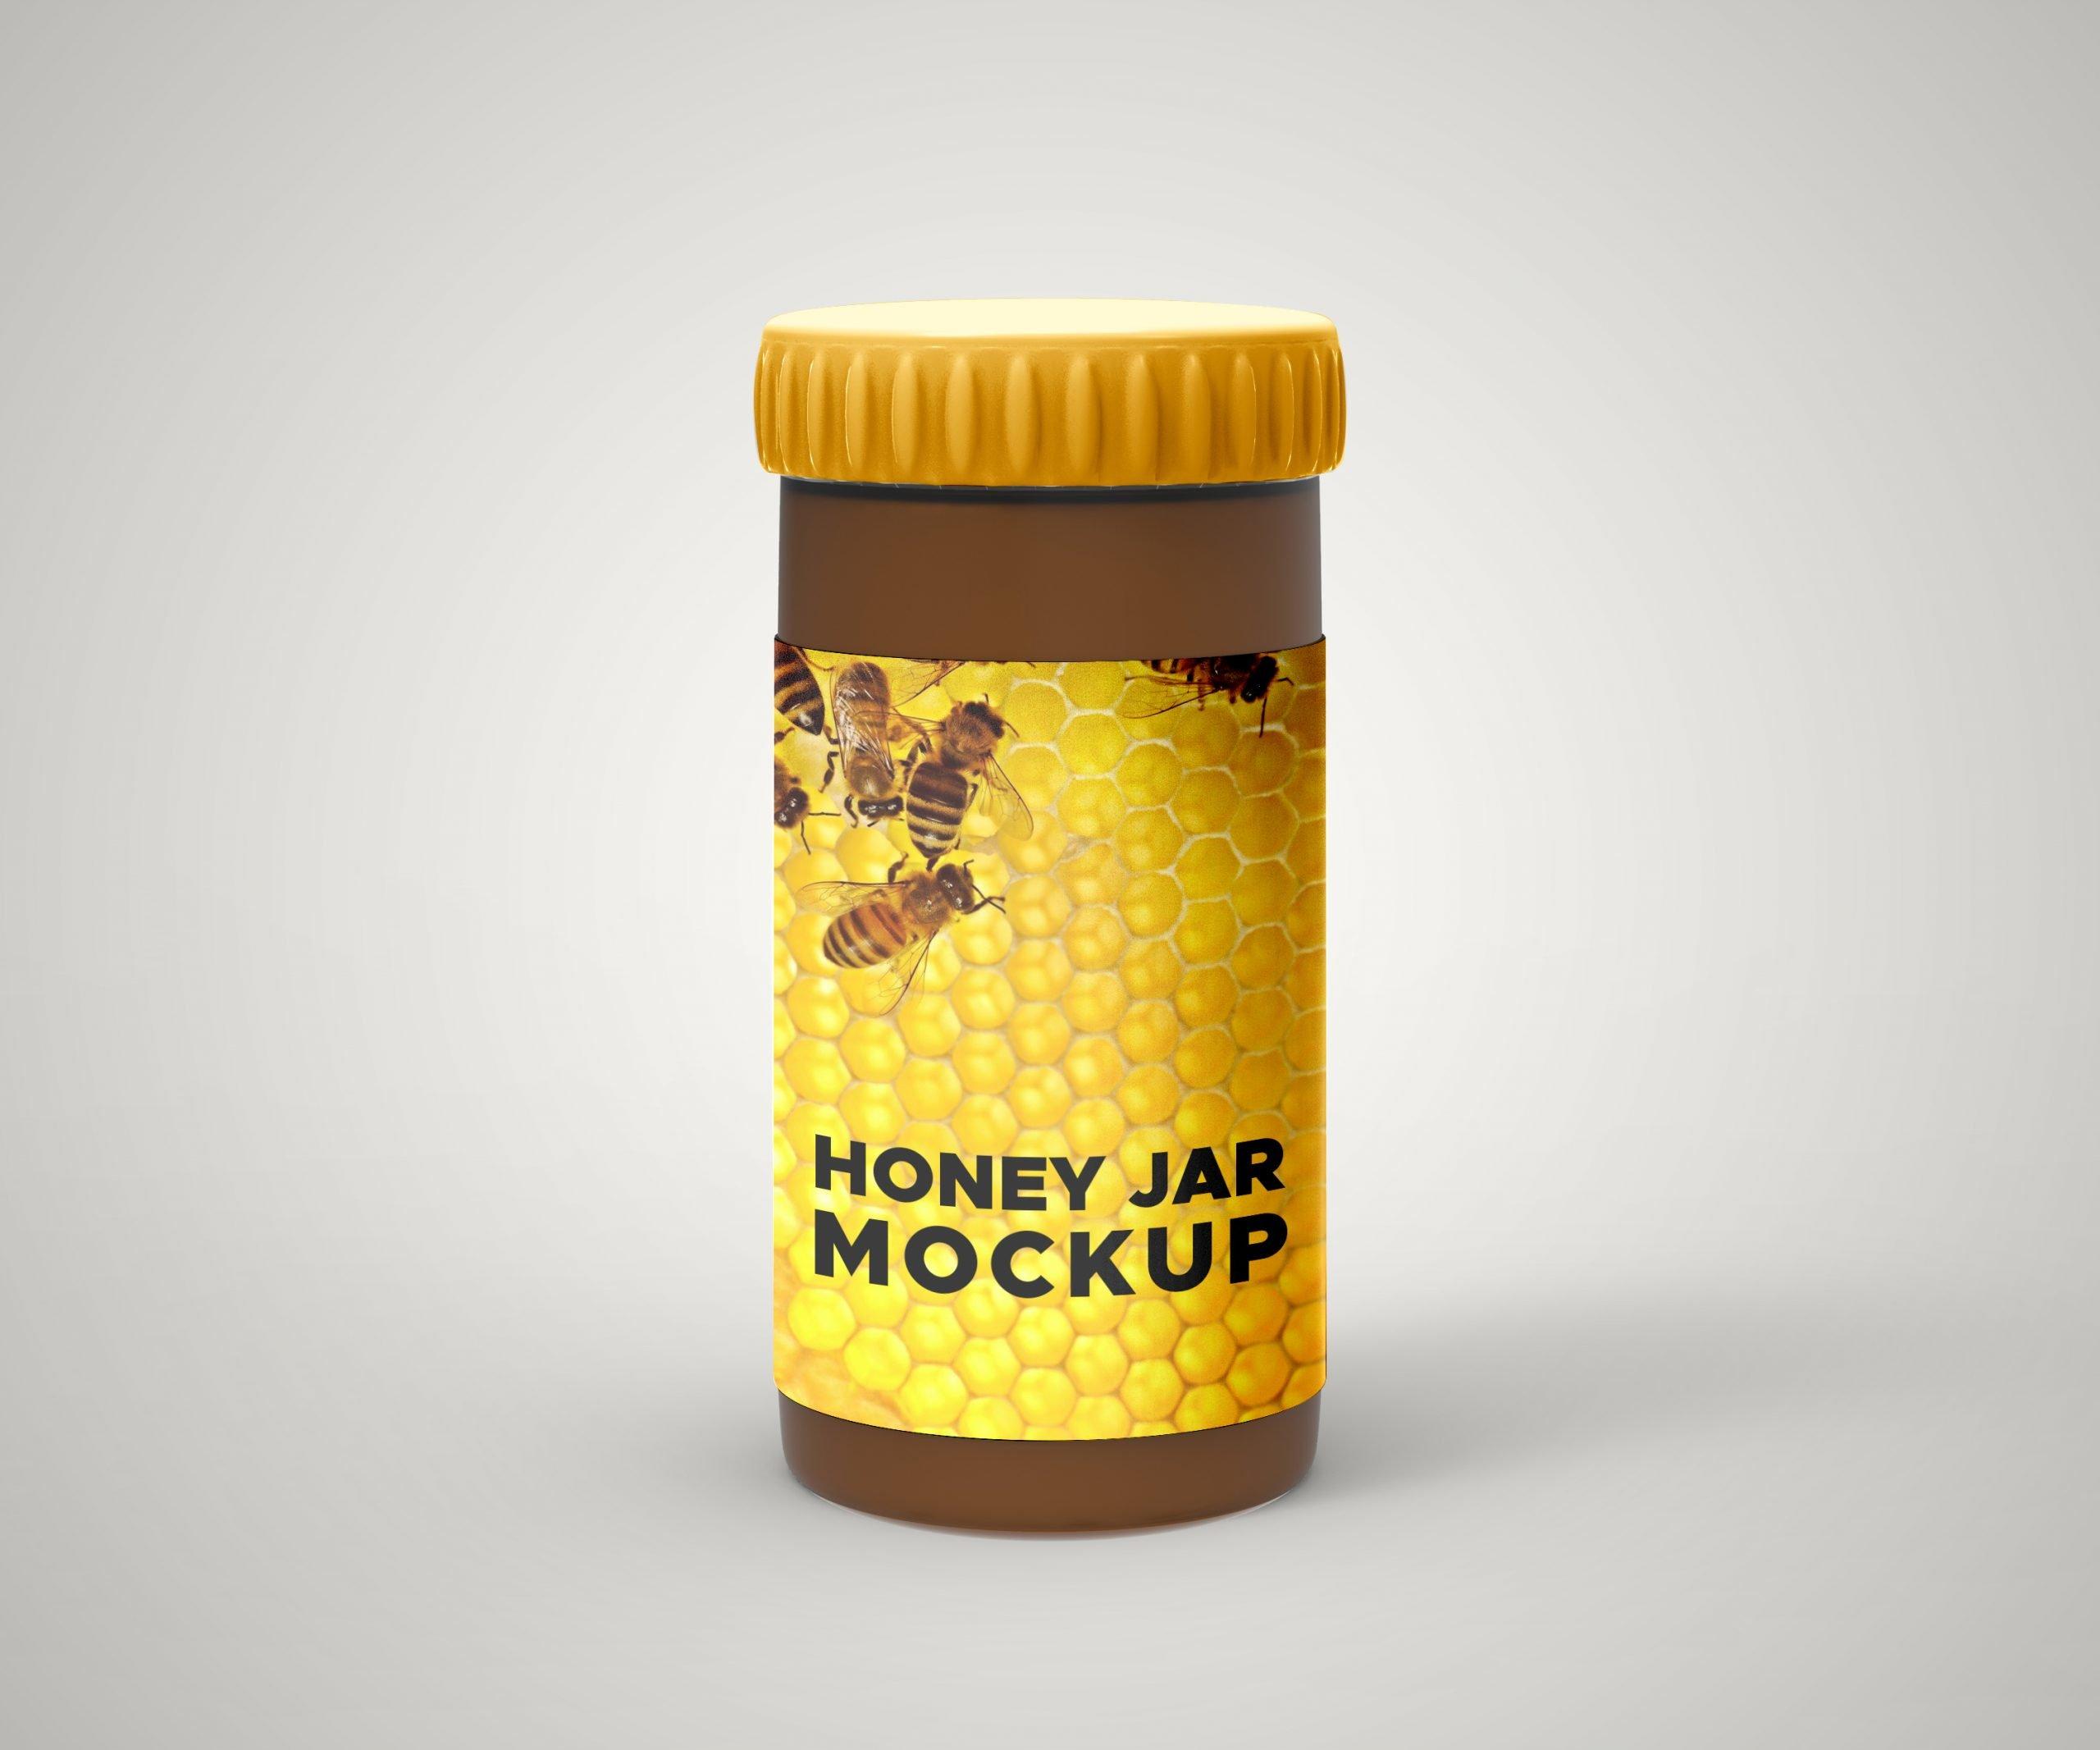 Download-Free-Honey-Jar-Mockup